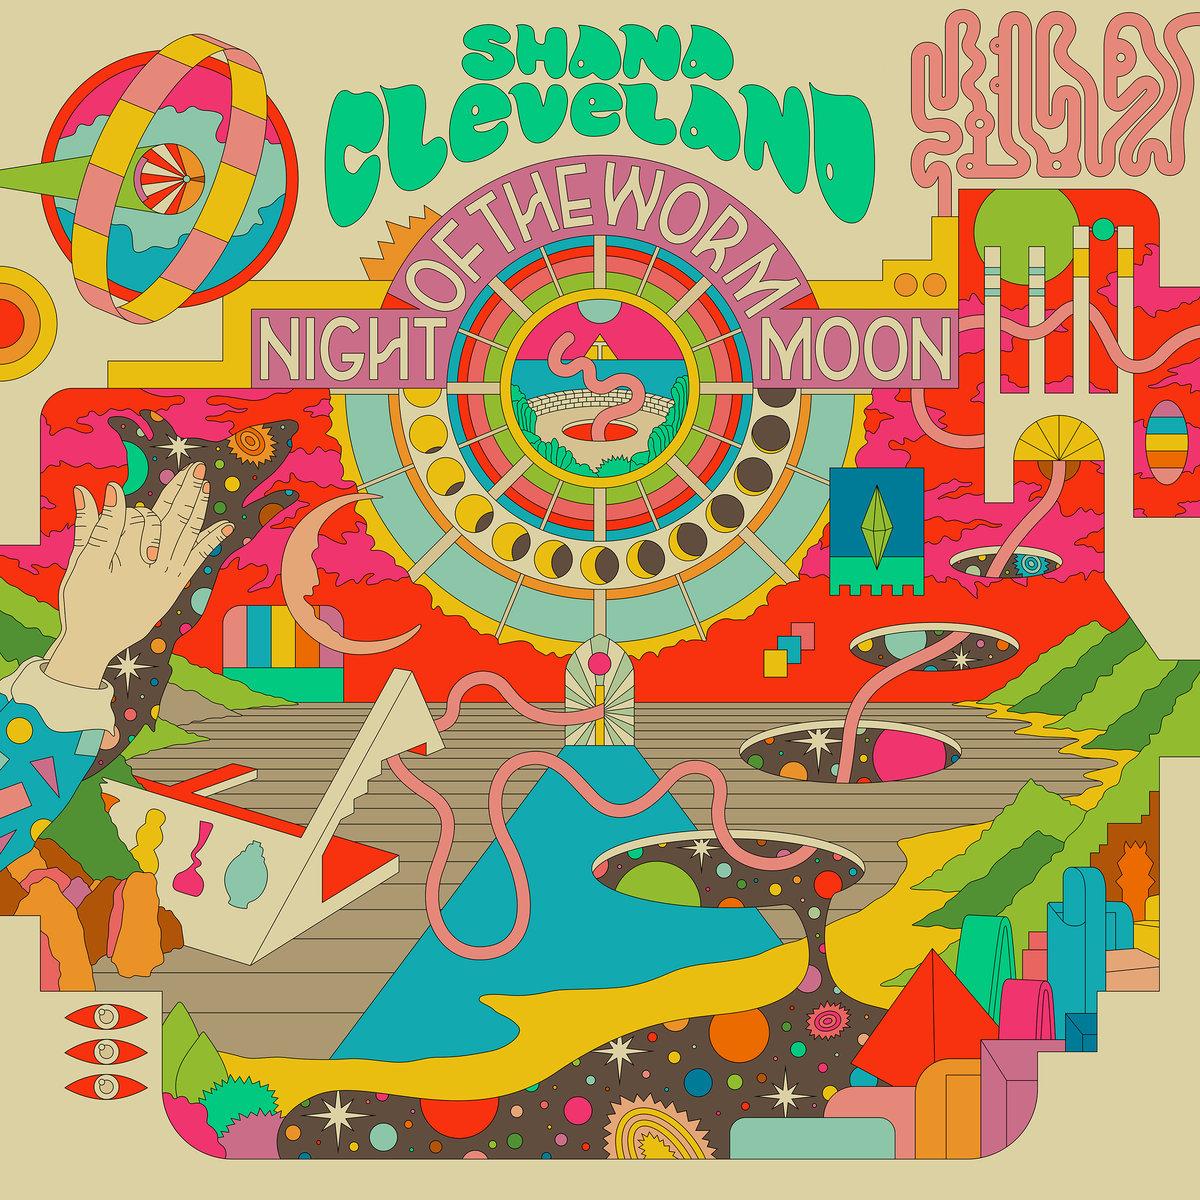 Shana Cleveland   Night Of The Worm Moon   Hardly Art